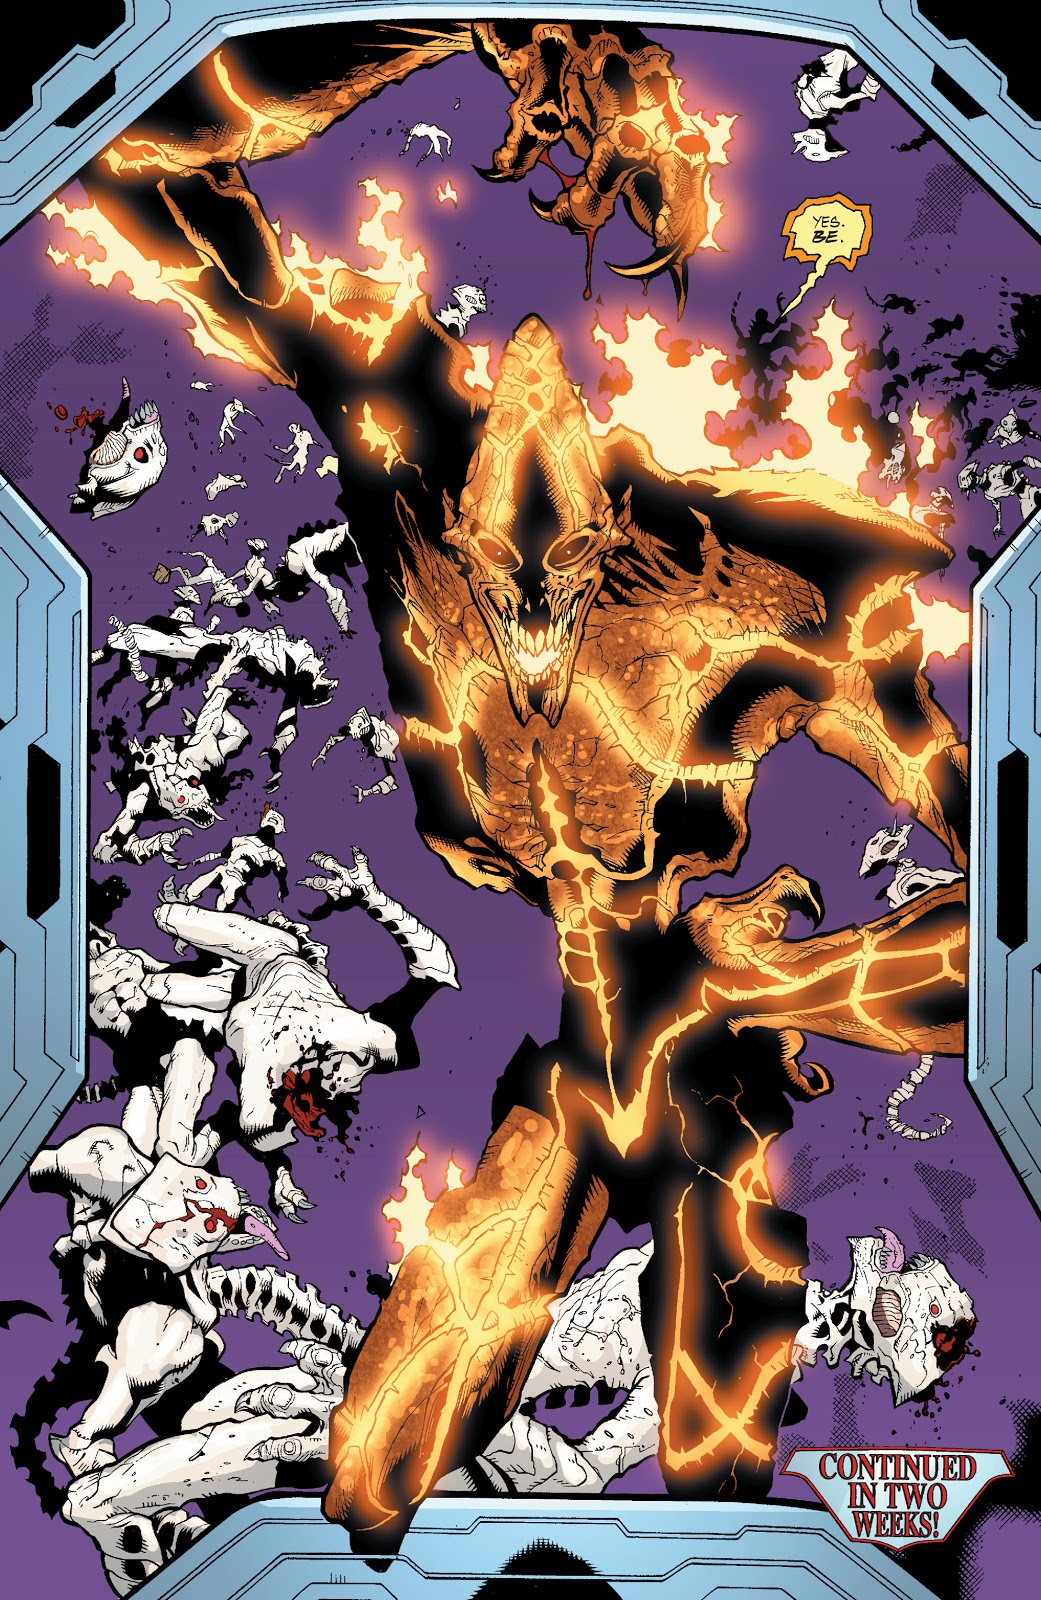 In 'JLA' (2003) #86, Fernus kills several hundreds White Martians in the Phantom Zone in the Fortress of Solitude.